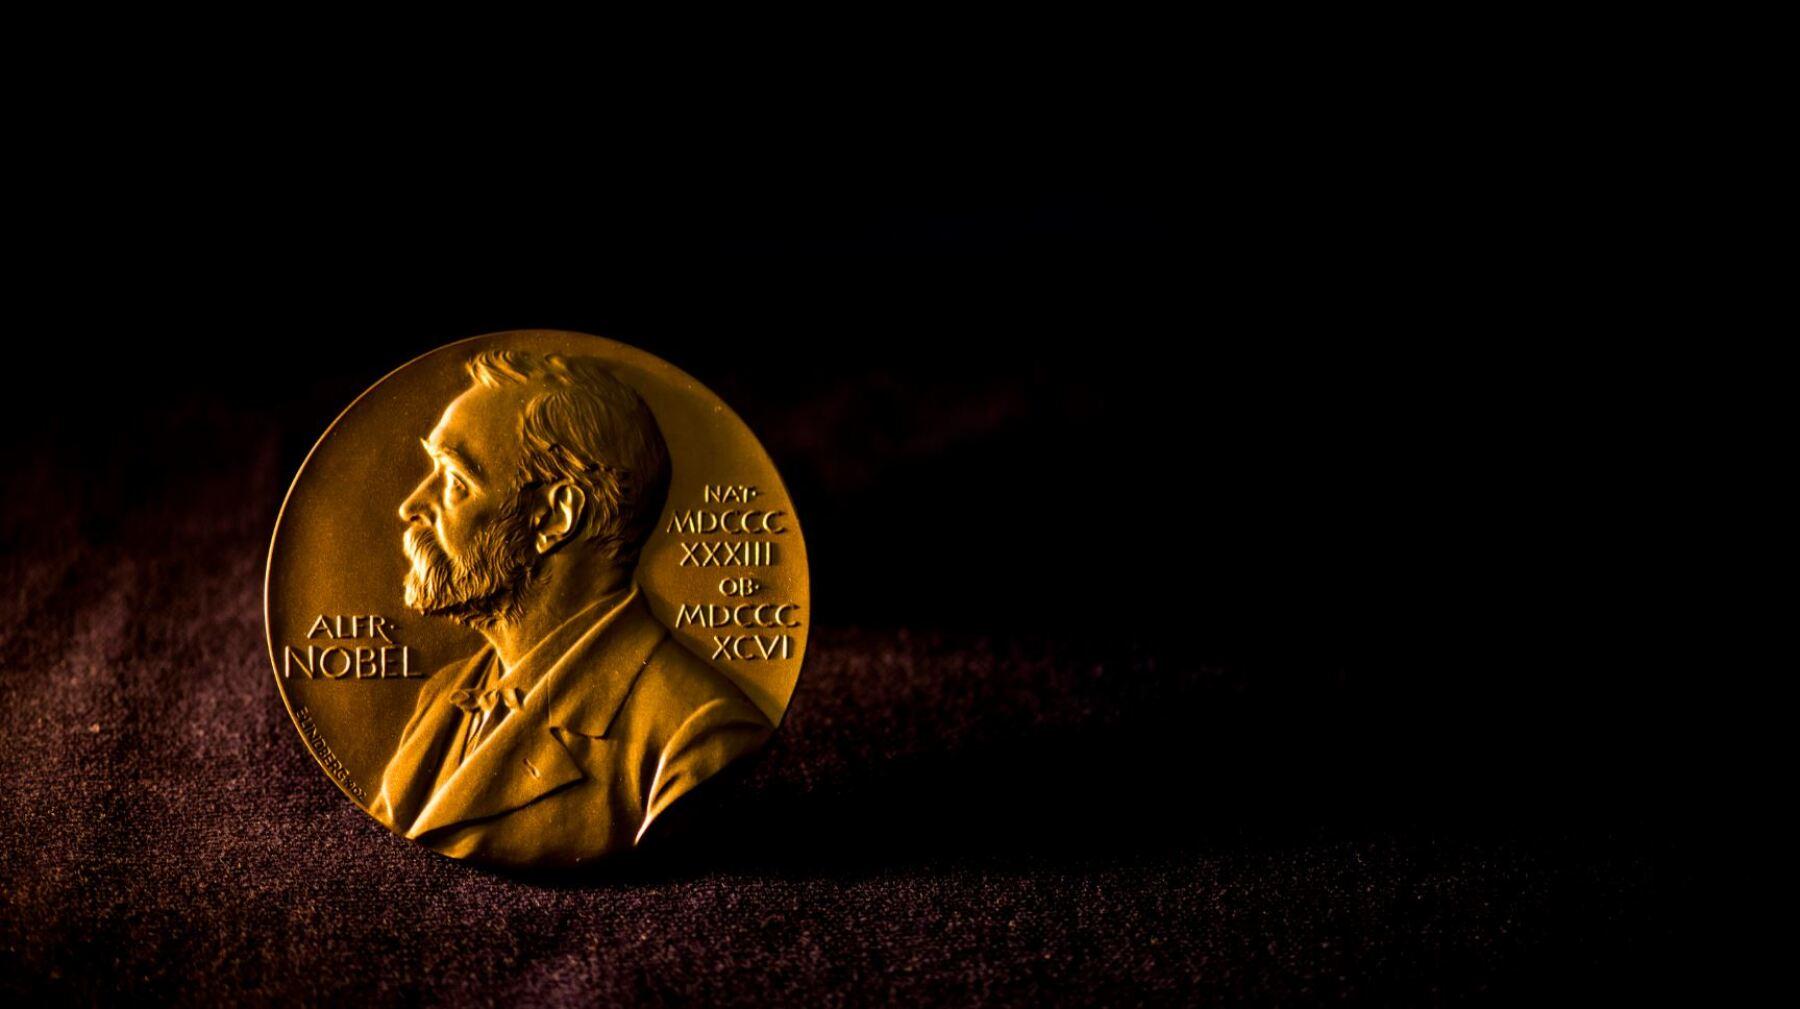 premio nobel.JPG